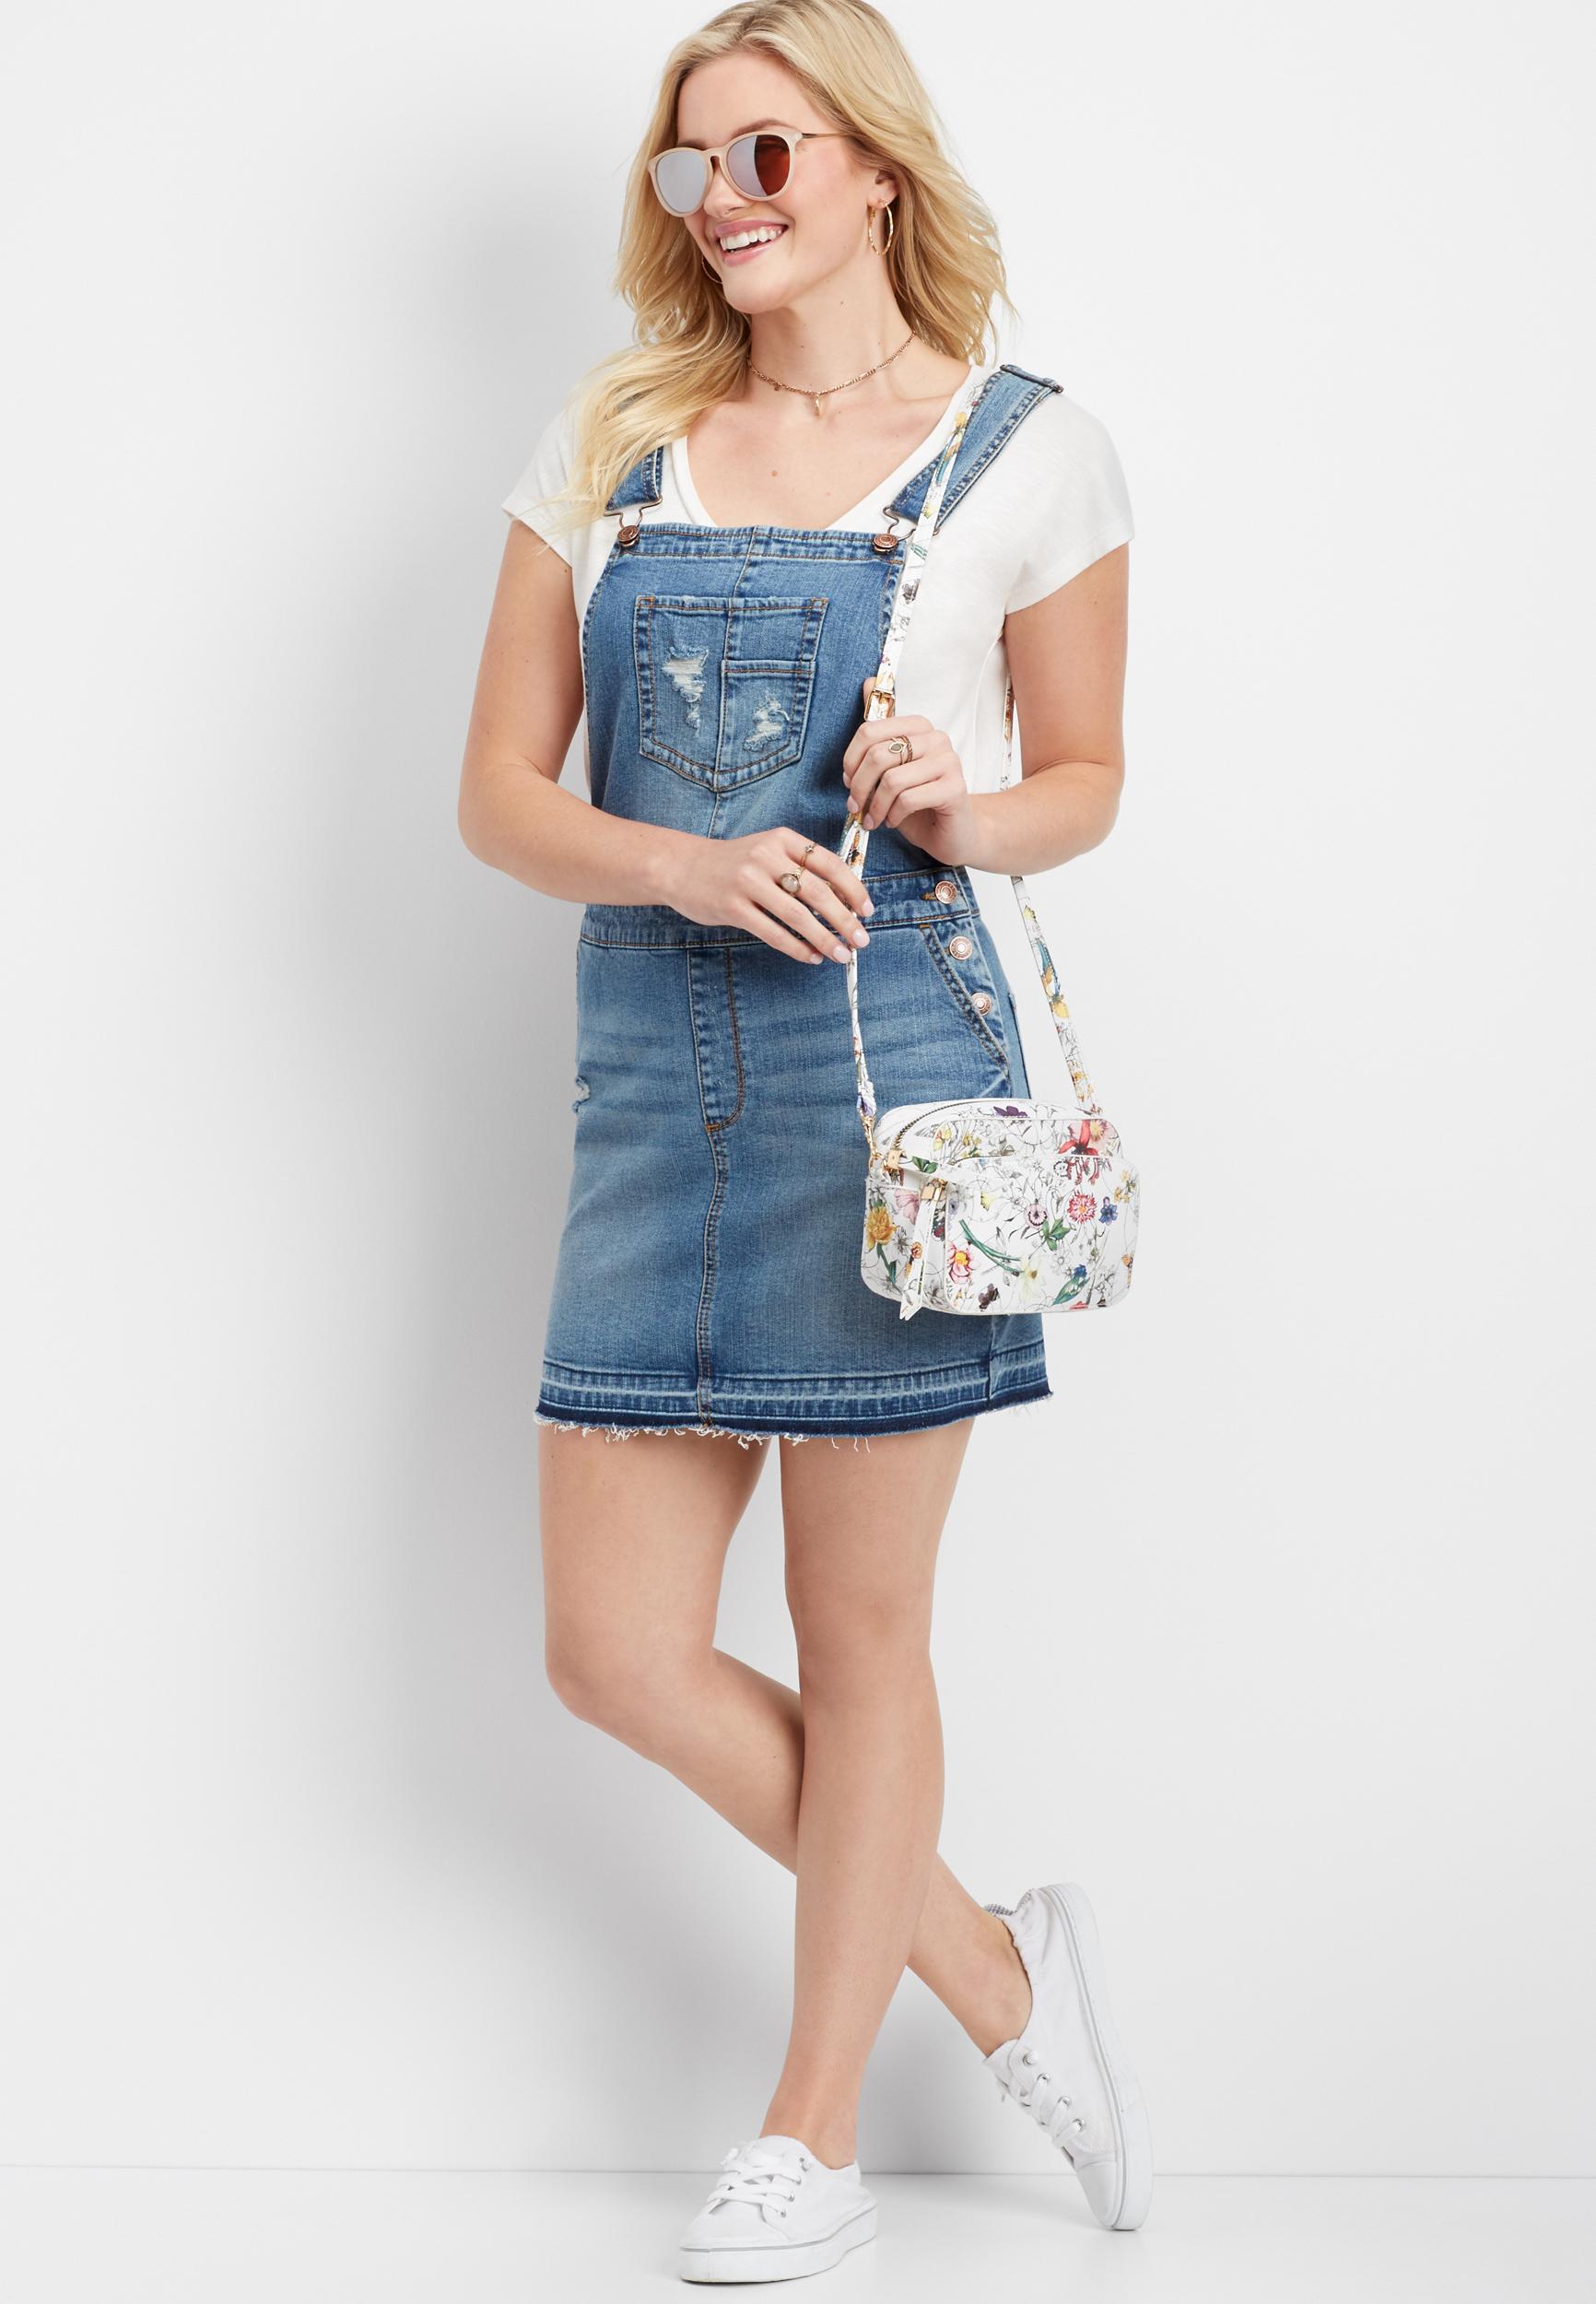 Denim Flex™ Medium Wash Skirt Overall by Maurices